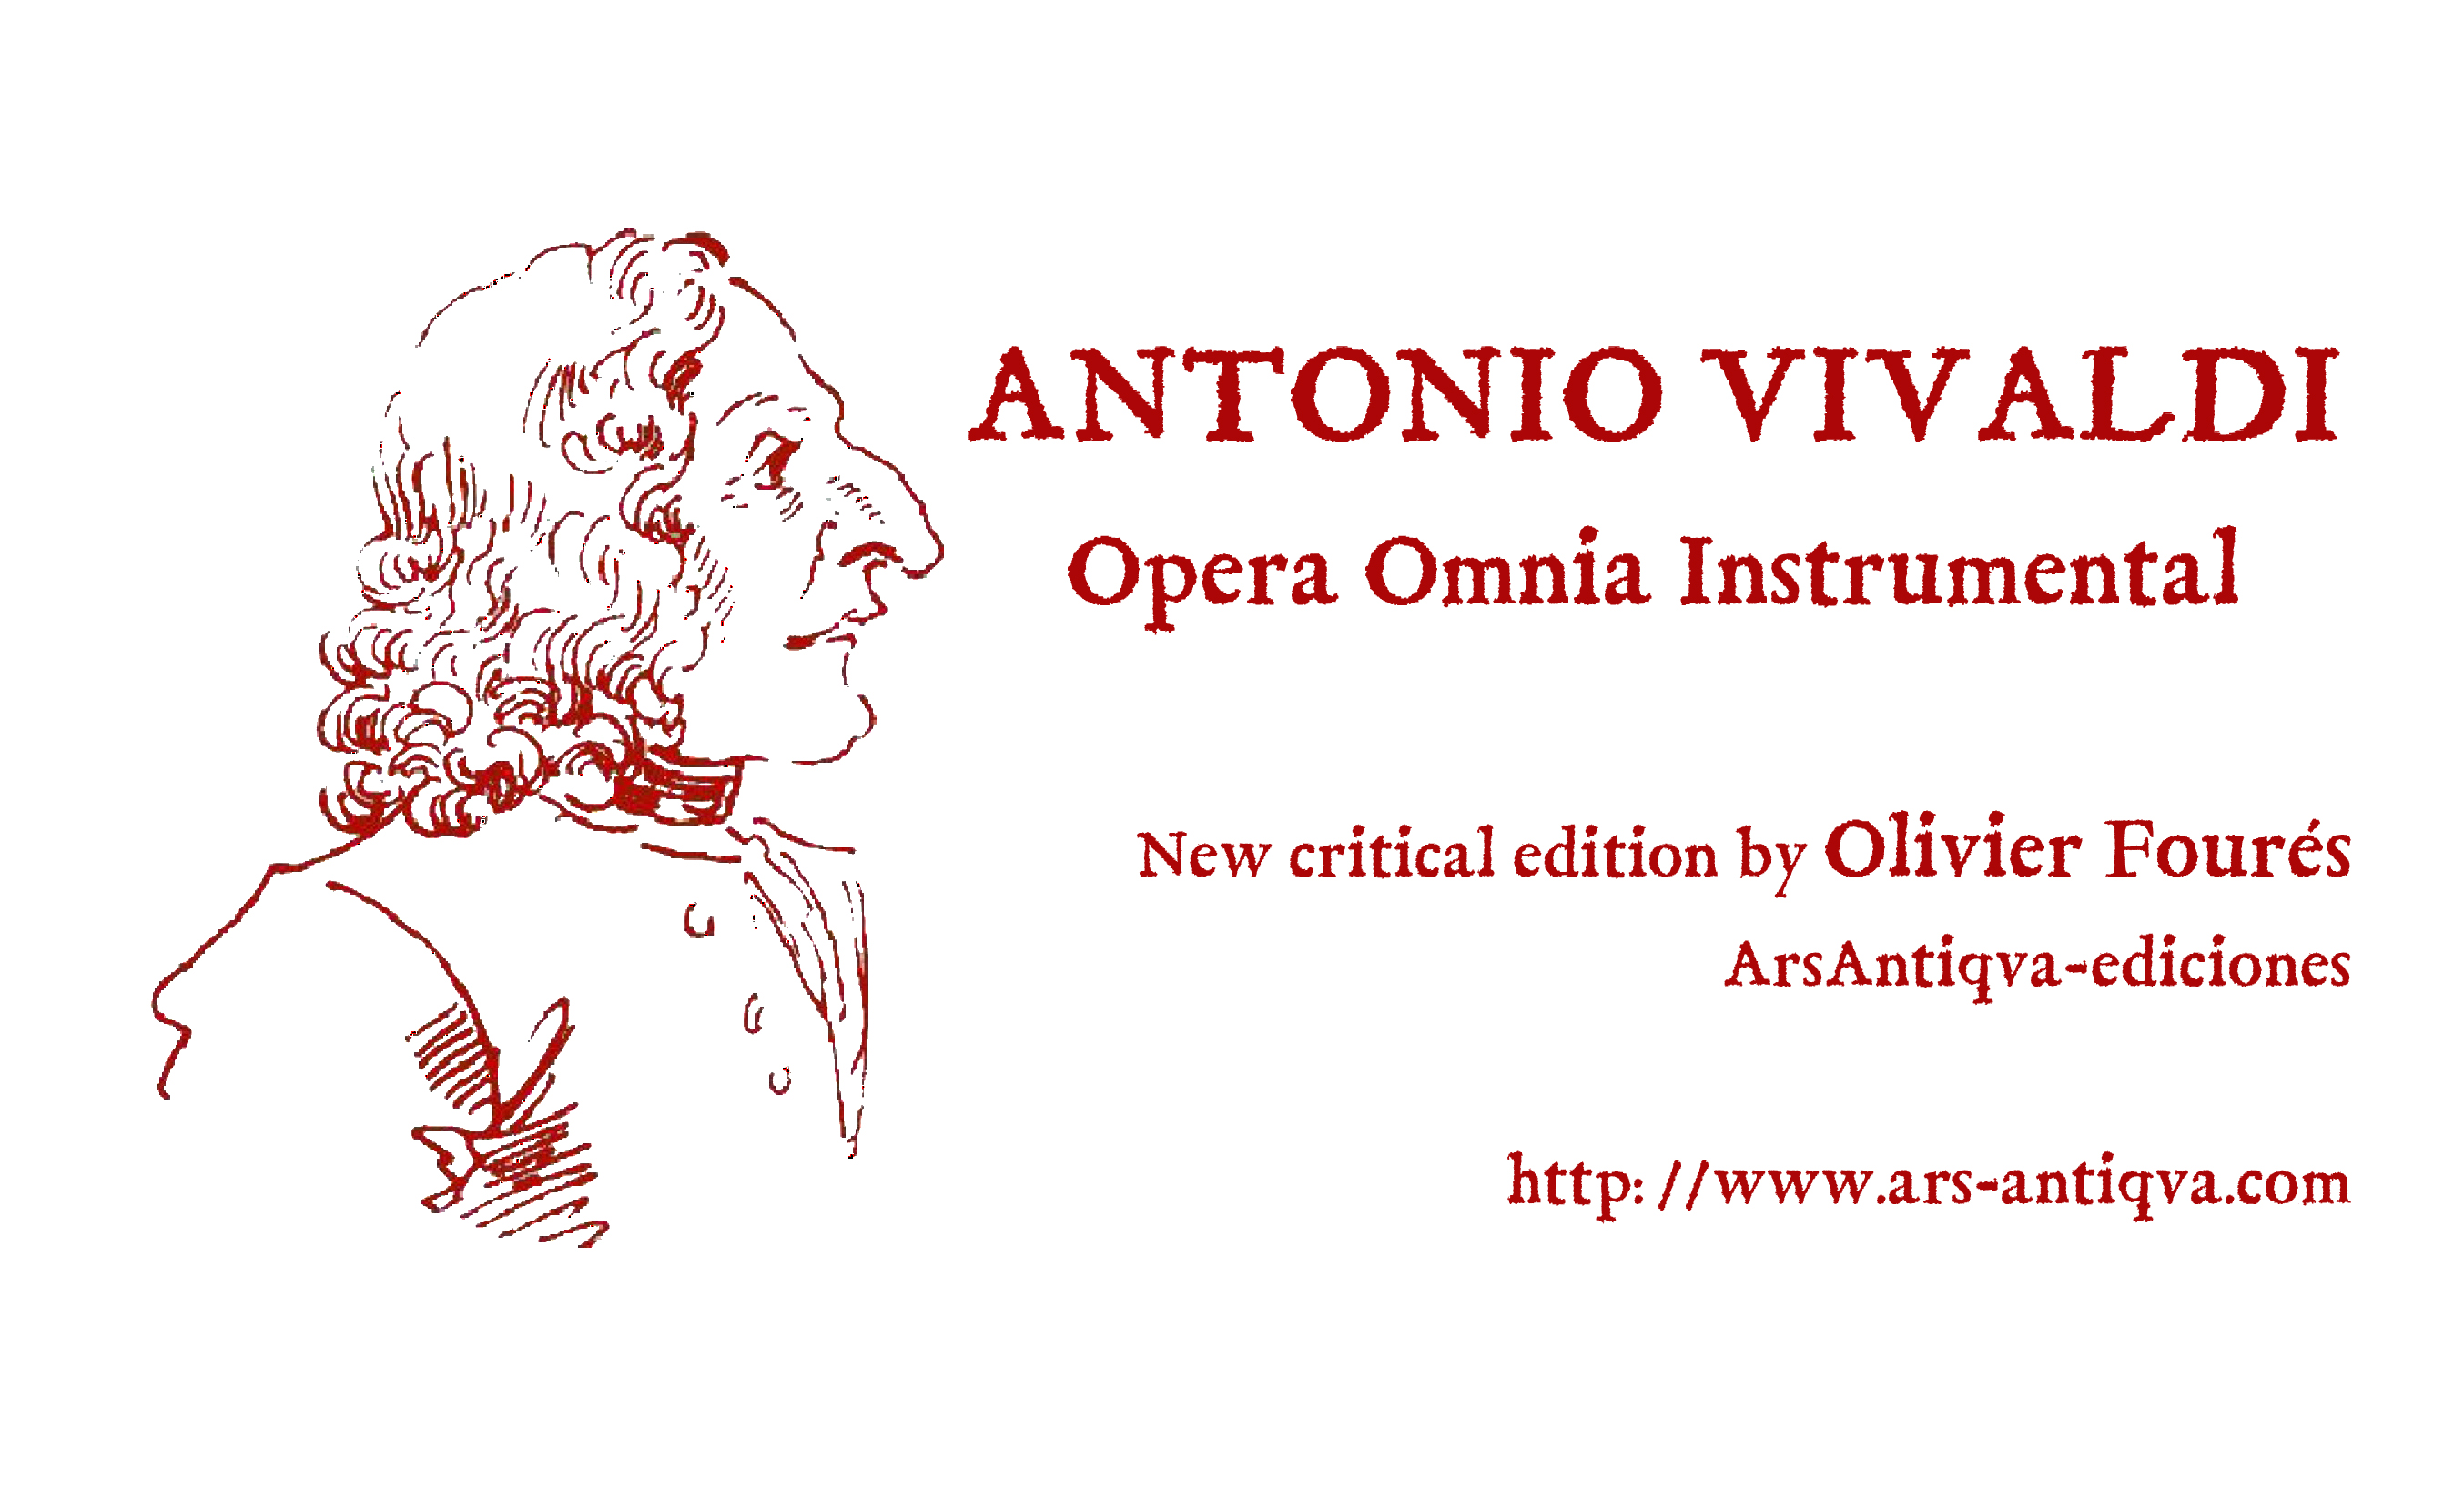 Vivaldi. Opera Omnia Instrumental - Ars Antiqva ediciones